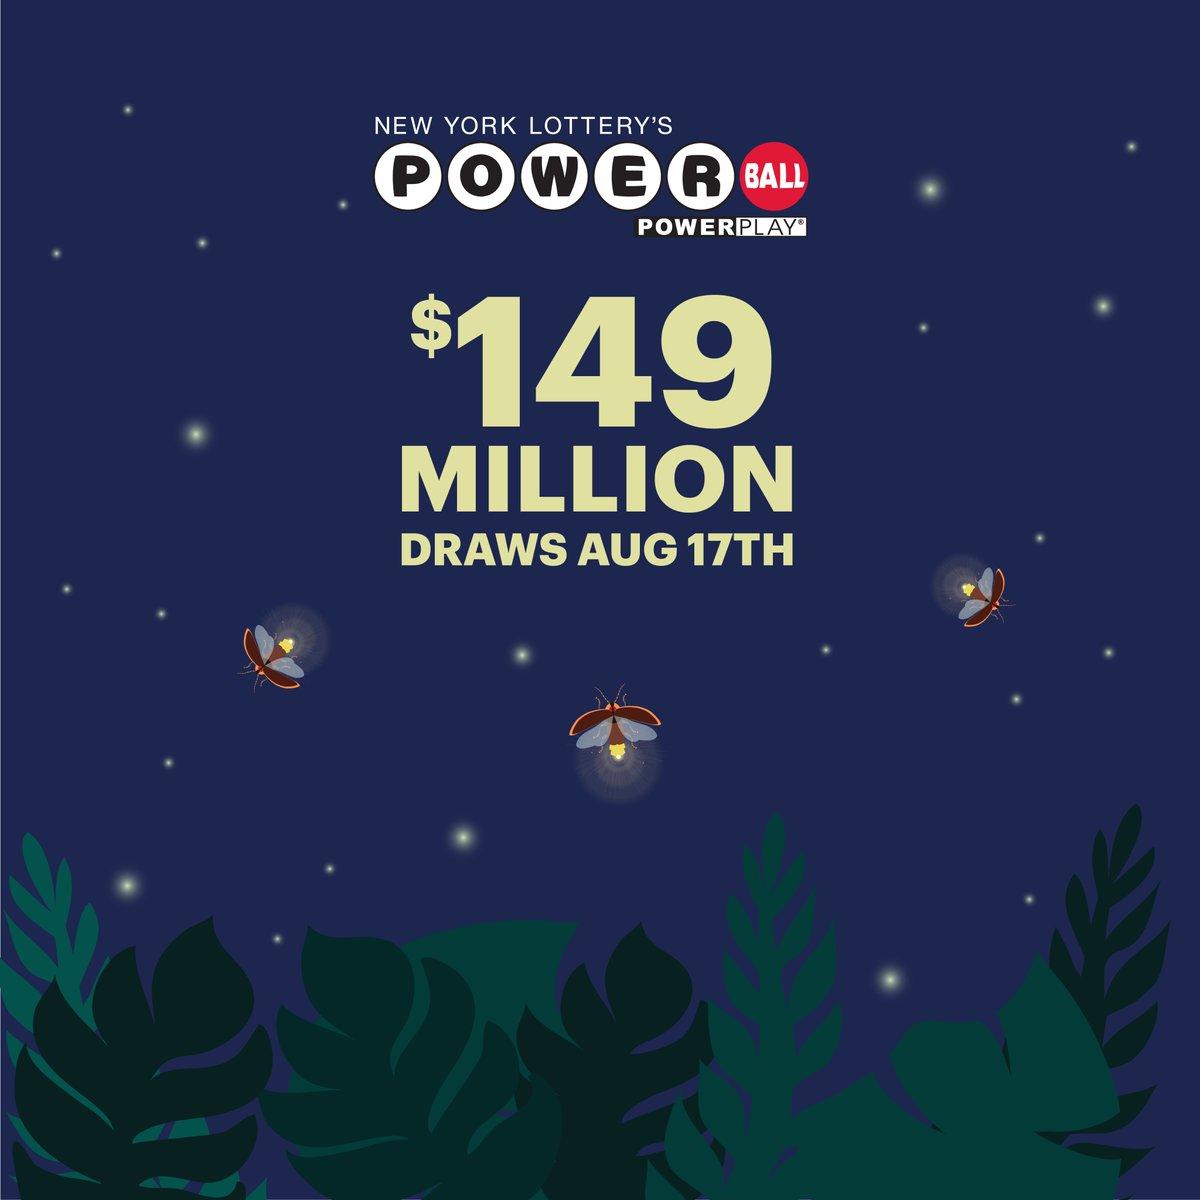 New York Lottery (@newyorklottery) | Twitter